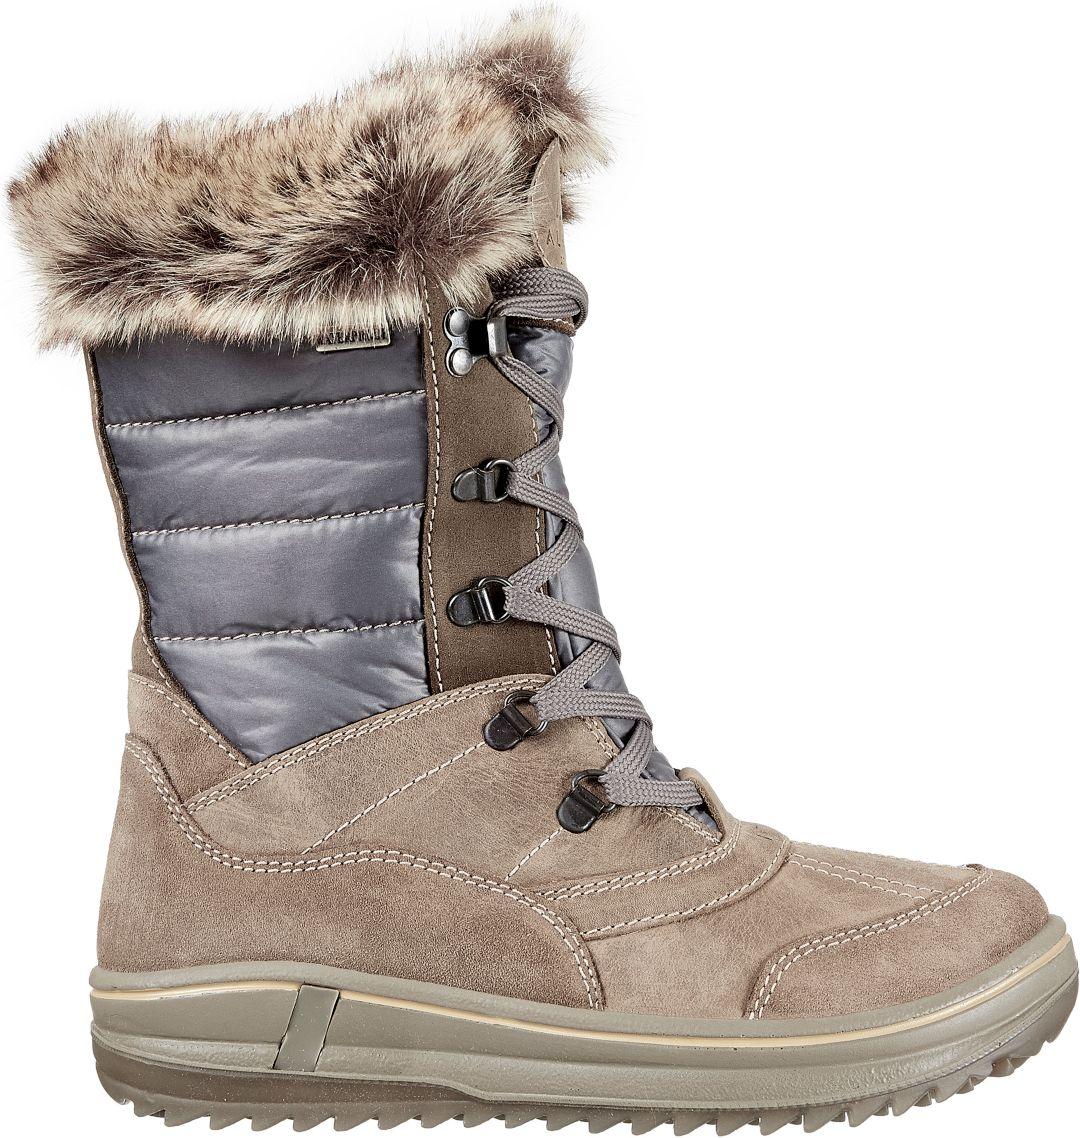 0aa8d412ae1 Alpine Design Women's Sofia Waterproof Winter Boots